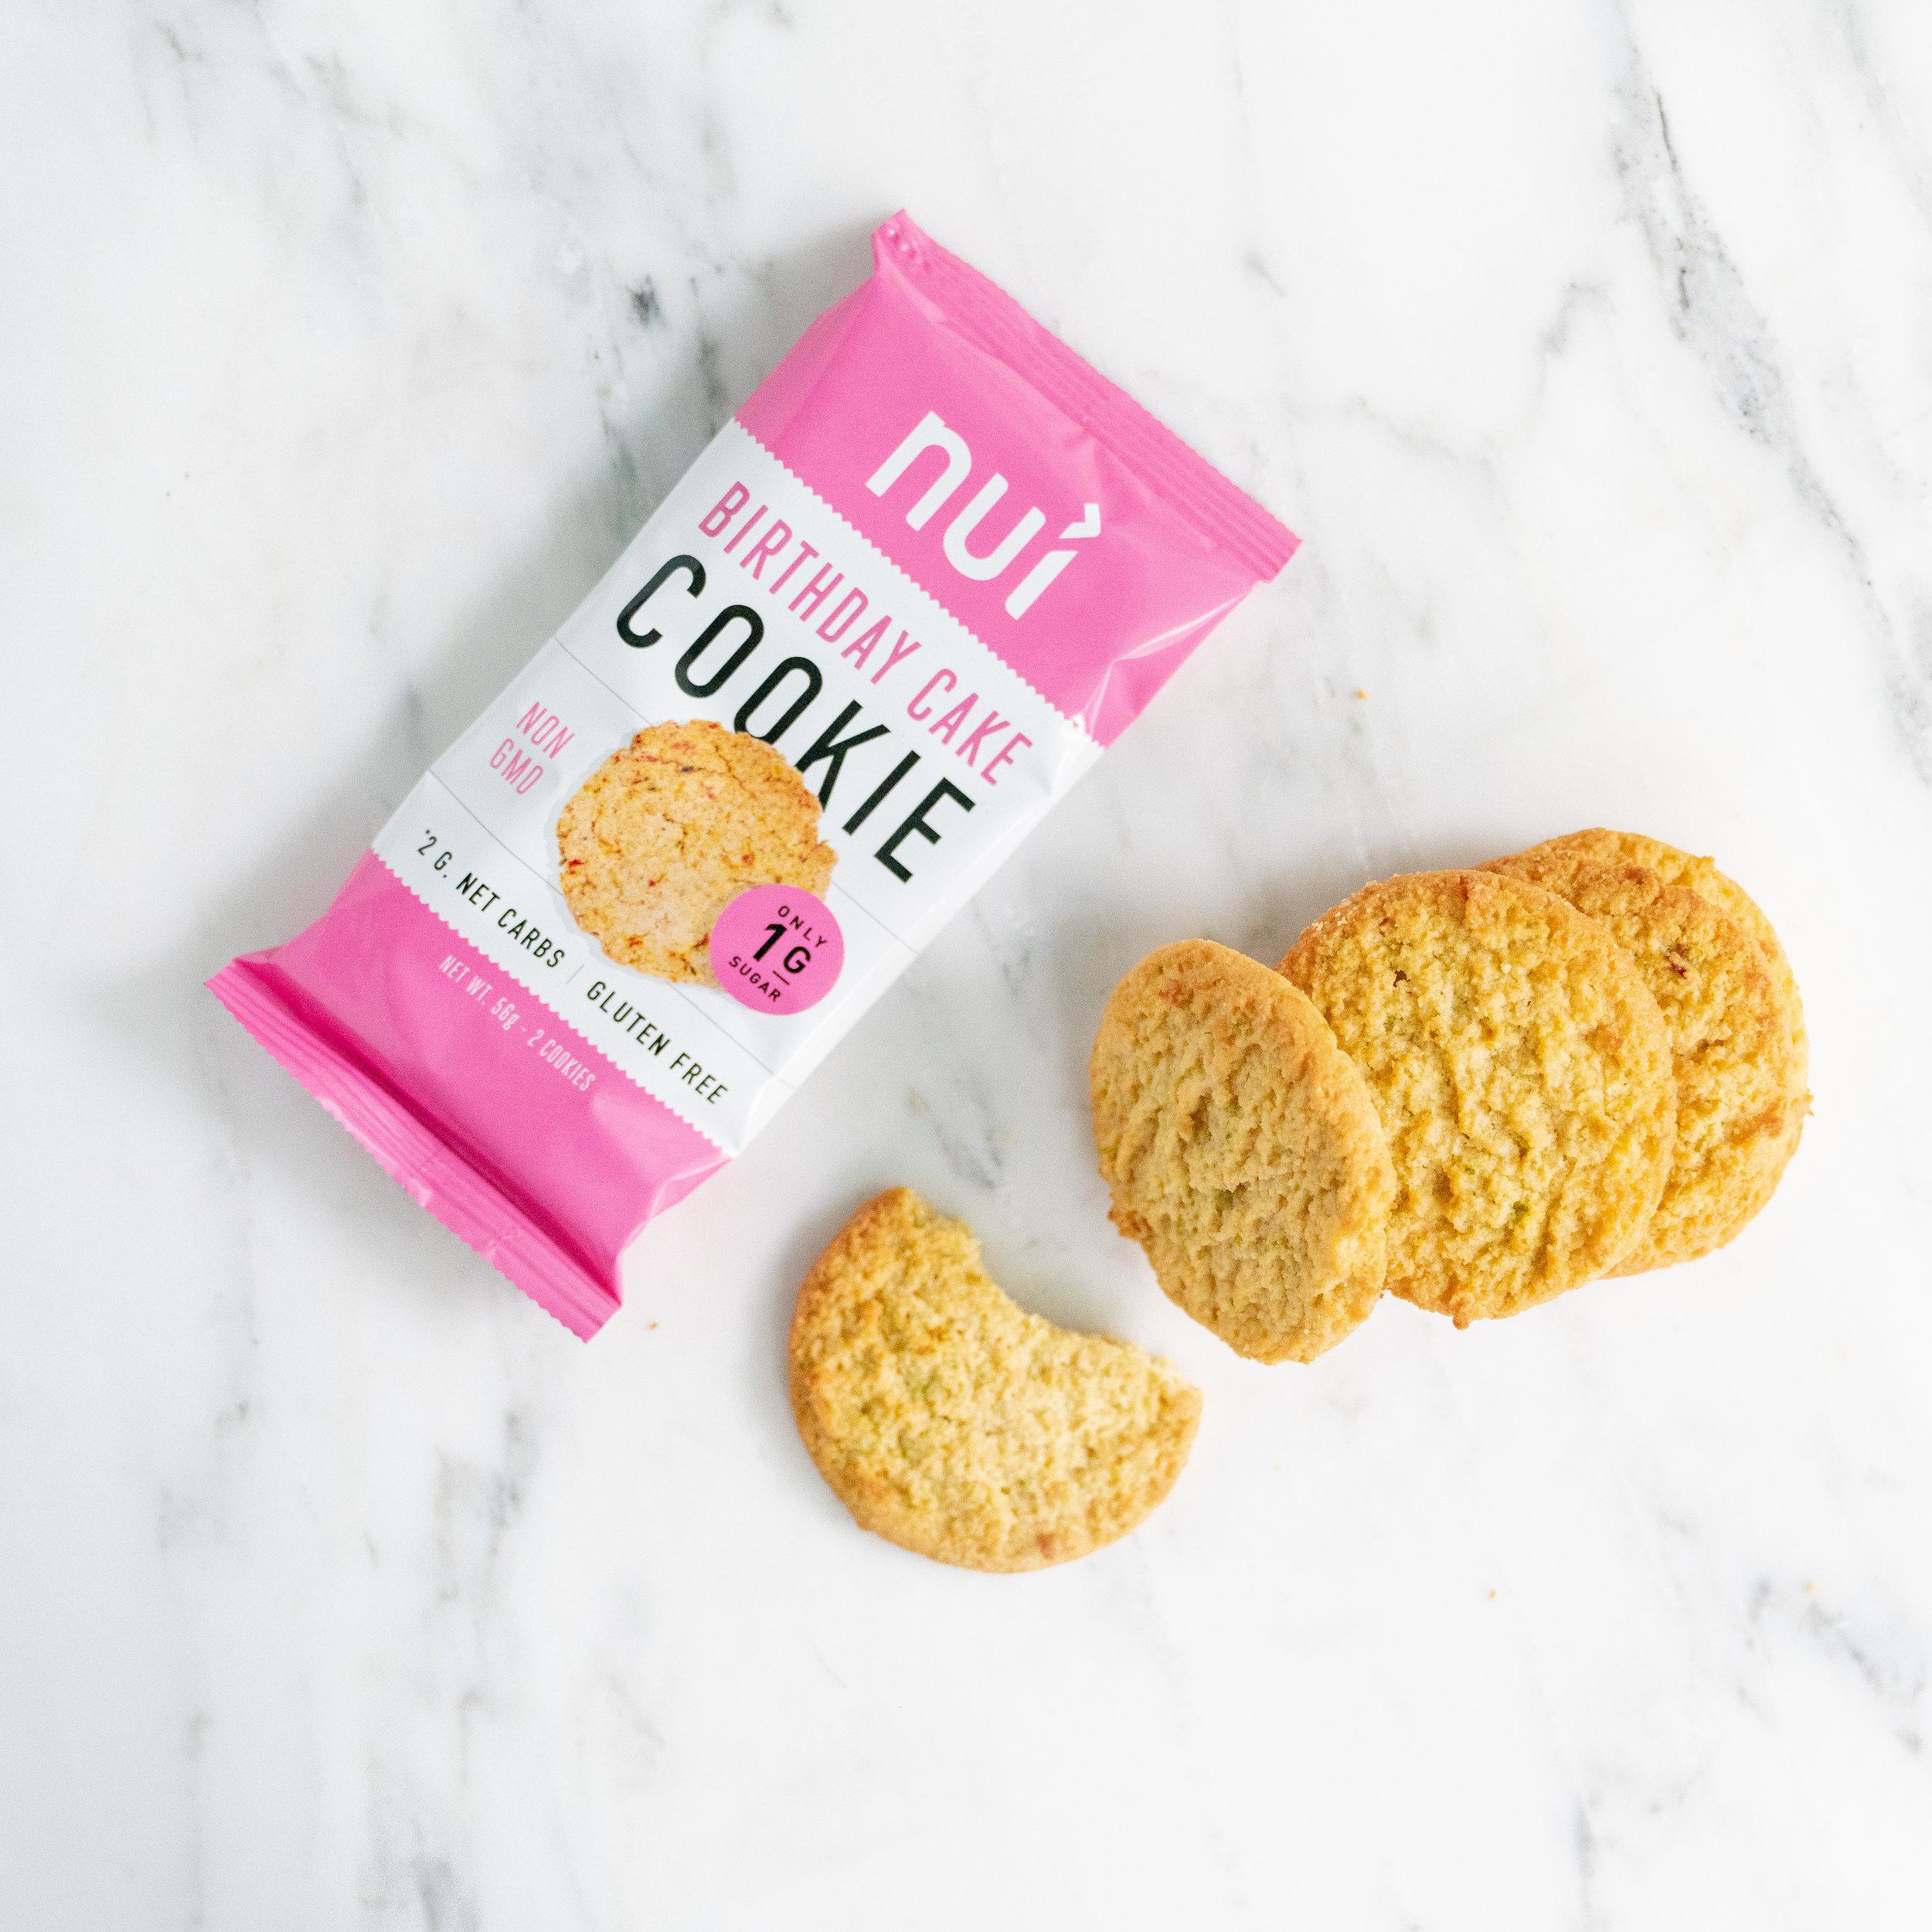 keto cookies nui ketointhecity